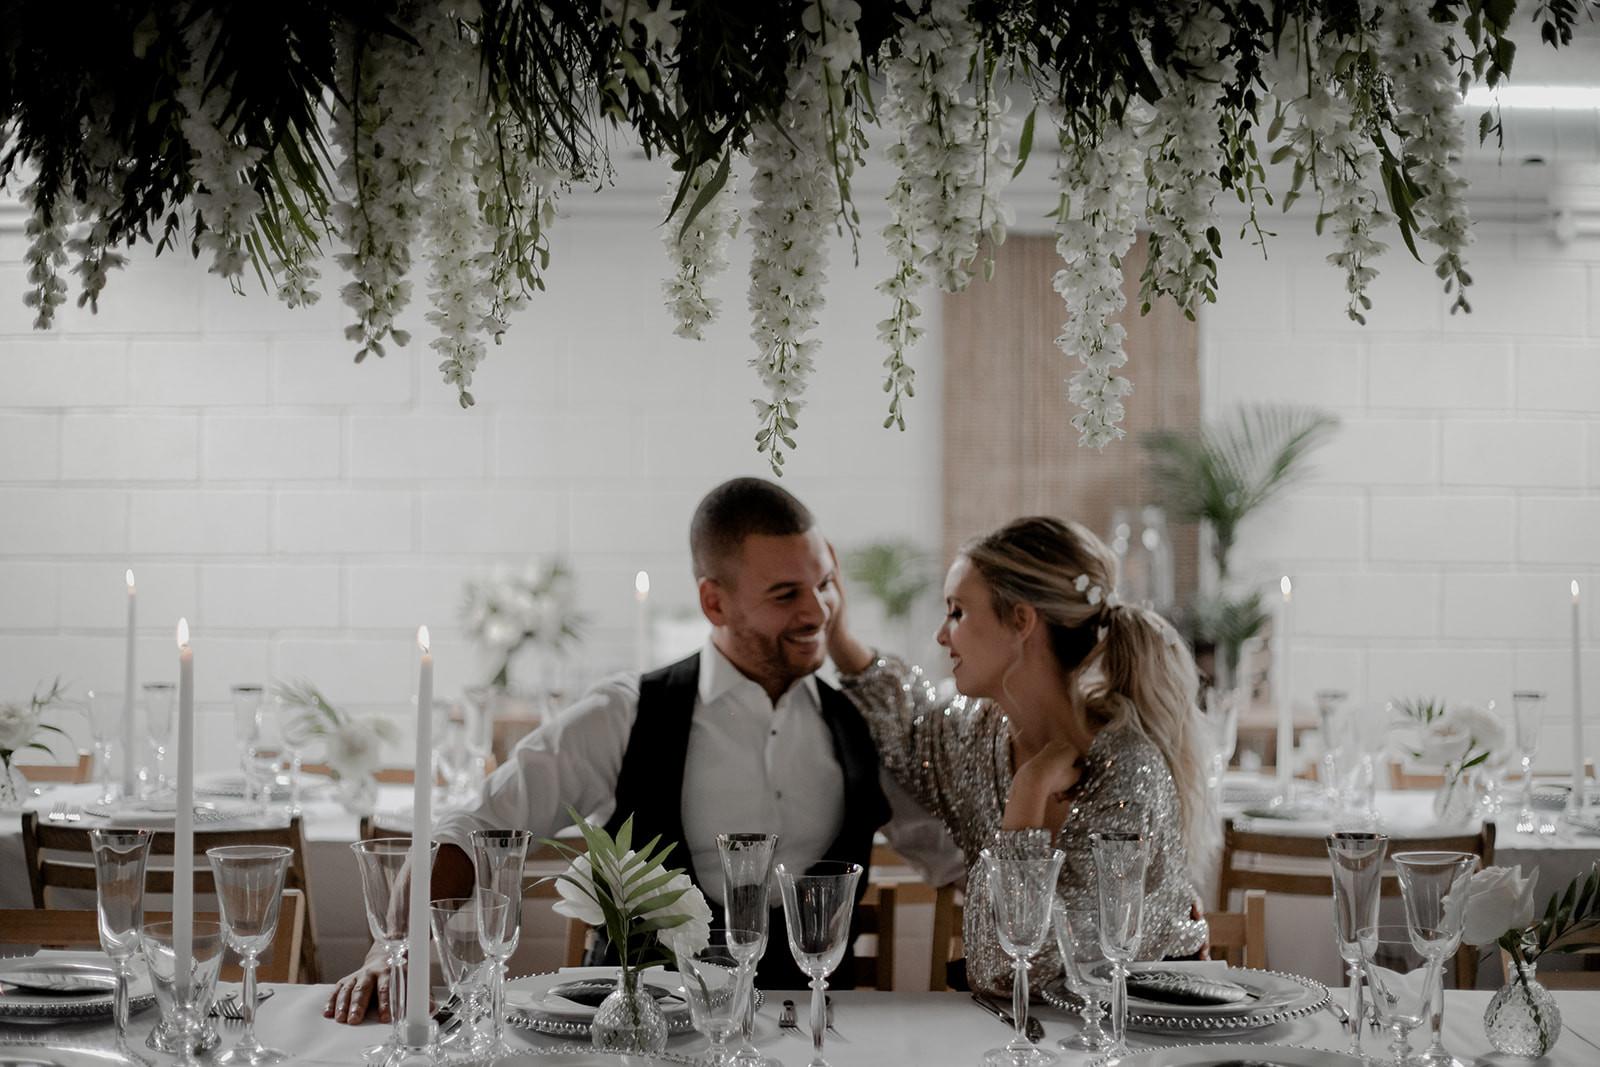 WeddingGallery@AvingtonBarn-124_websize.